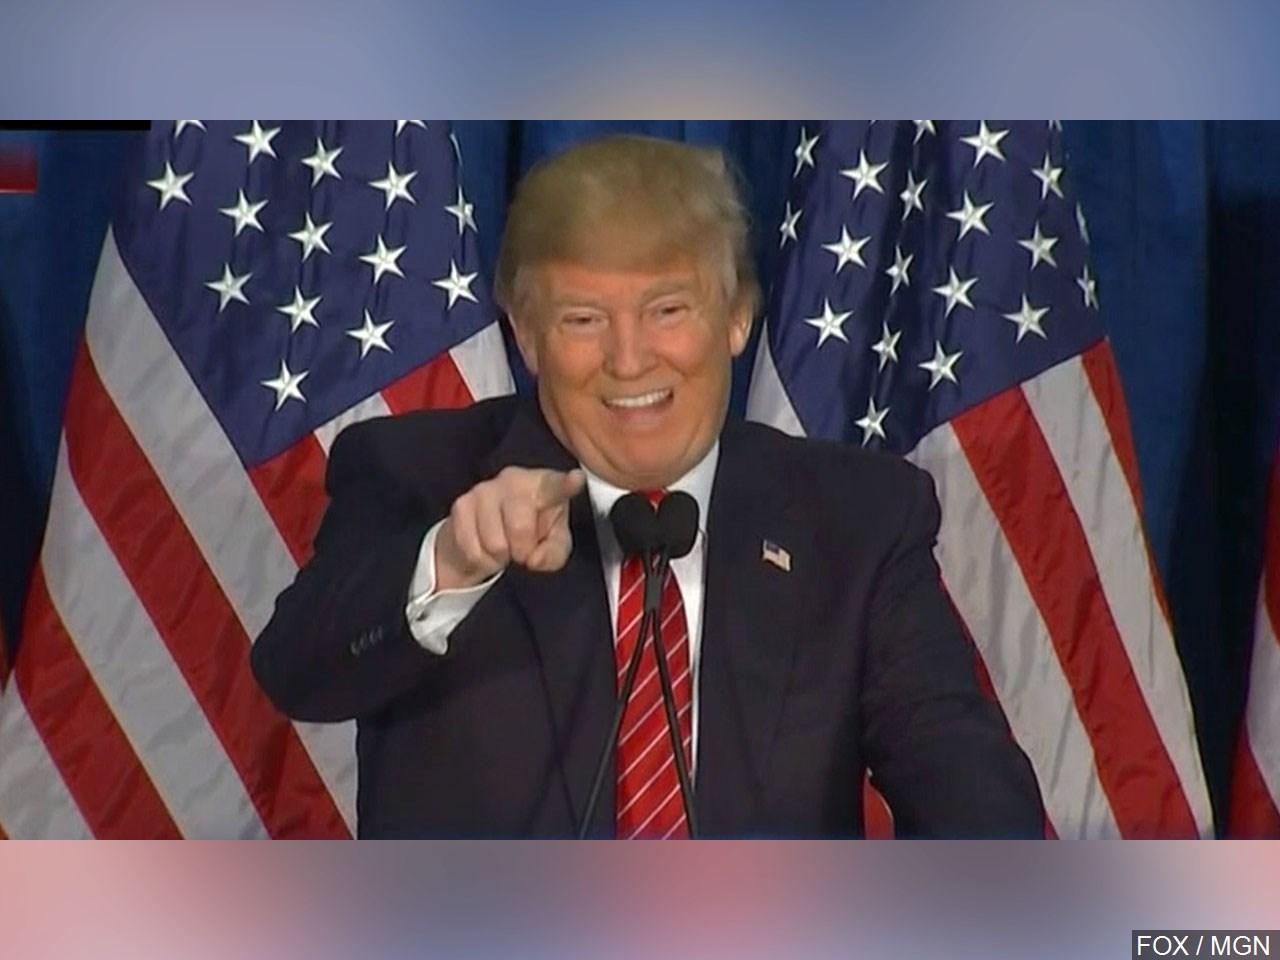 Trump Pointing.jpg